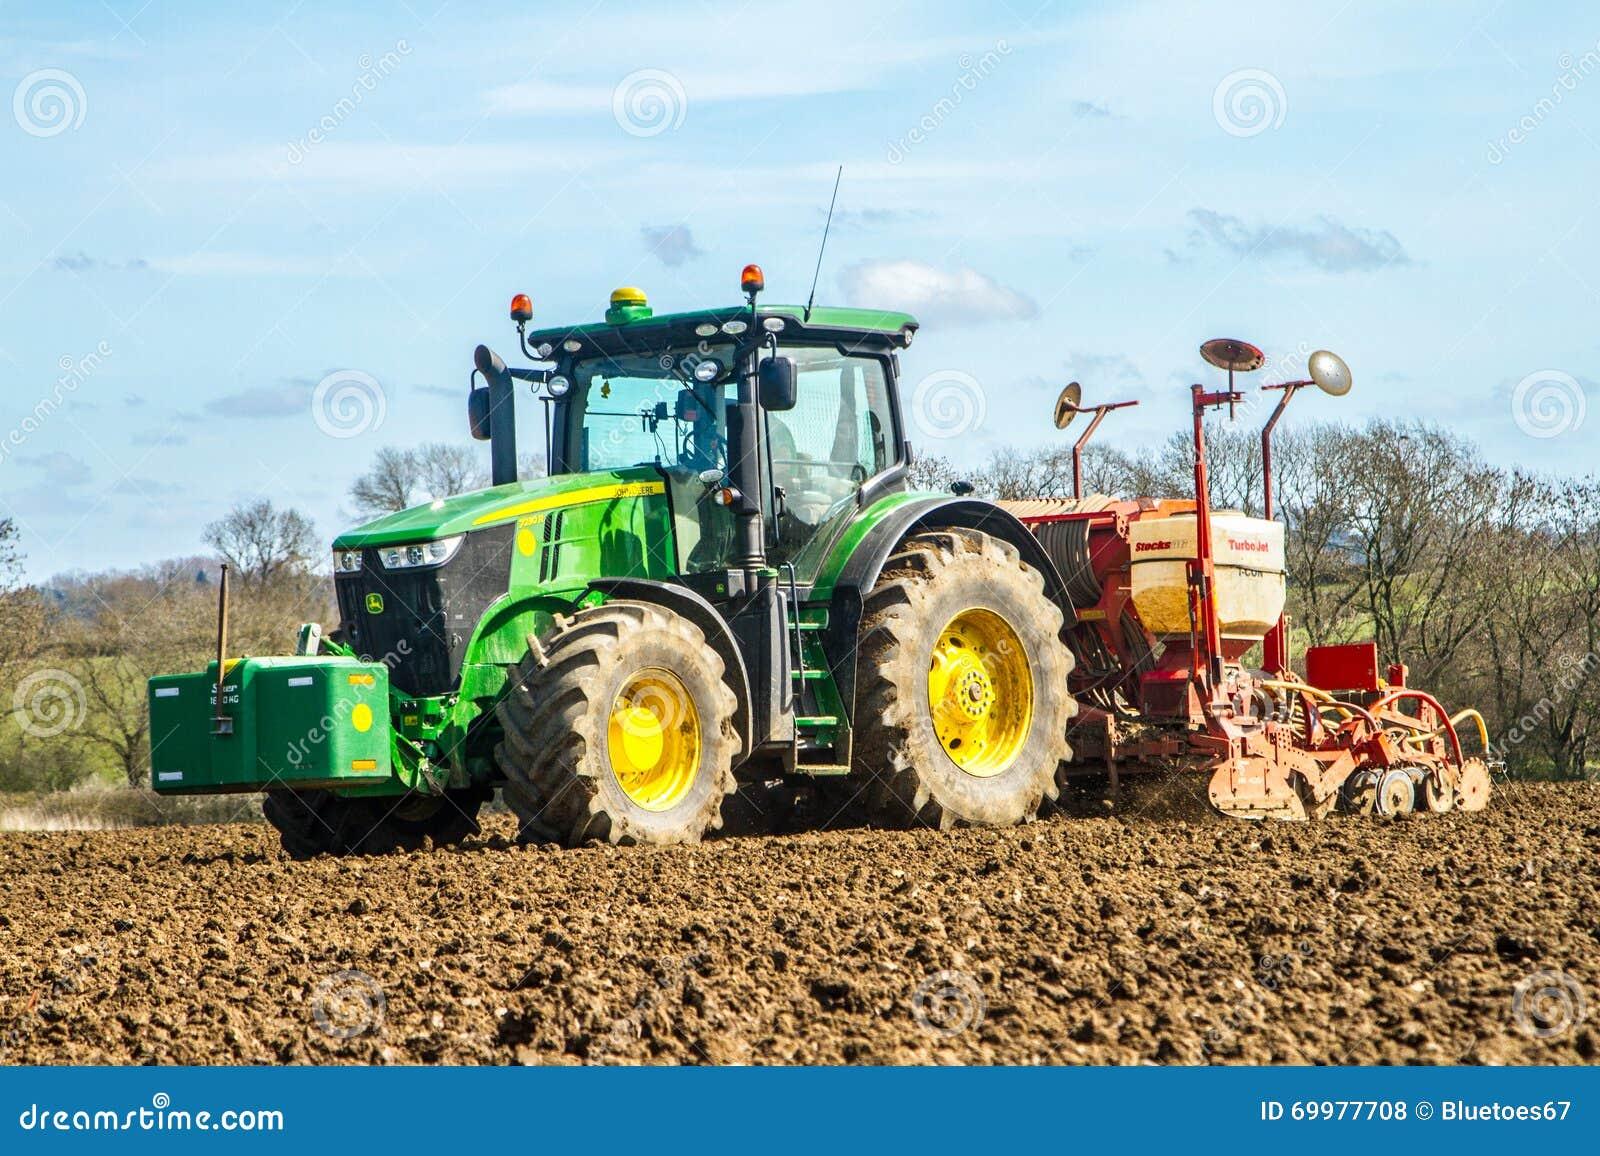 Tractor In Field Planting : Modern john deere tractor drilling seed in field editorial